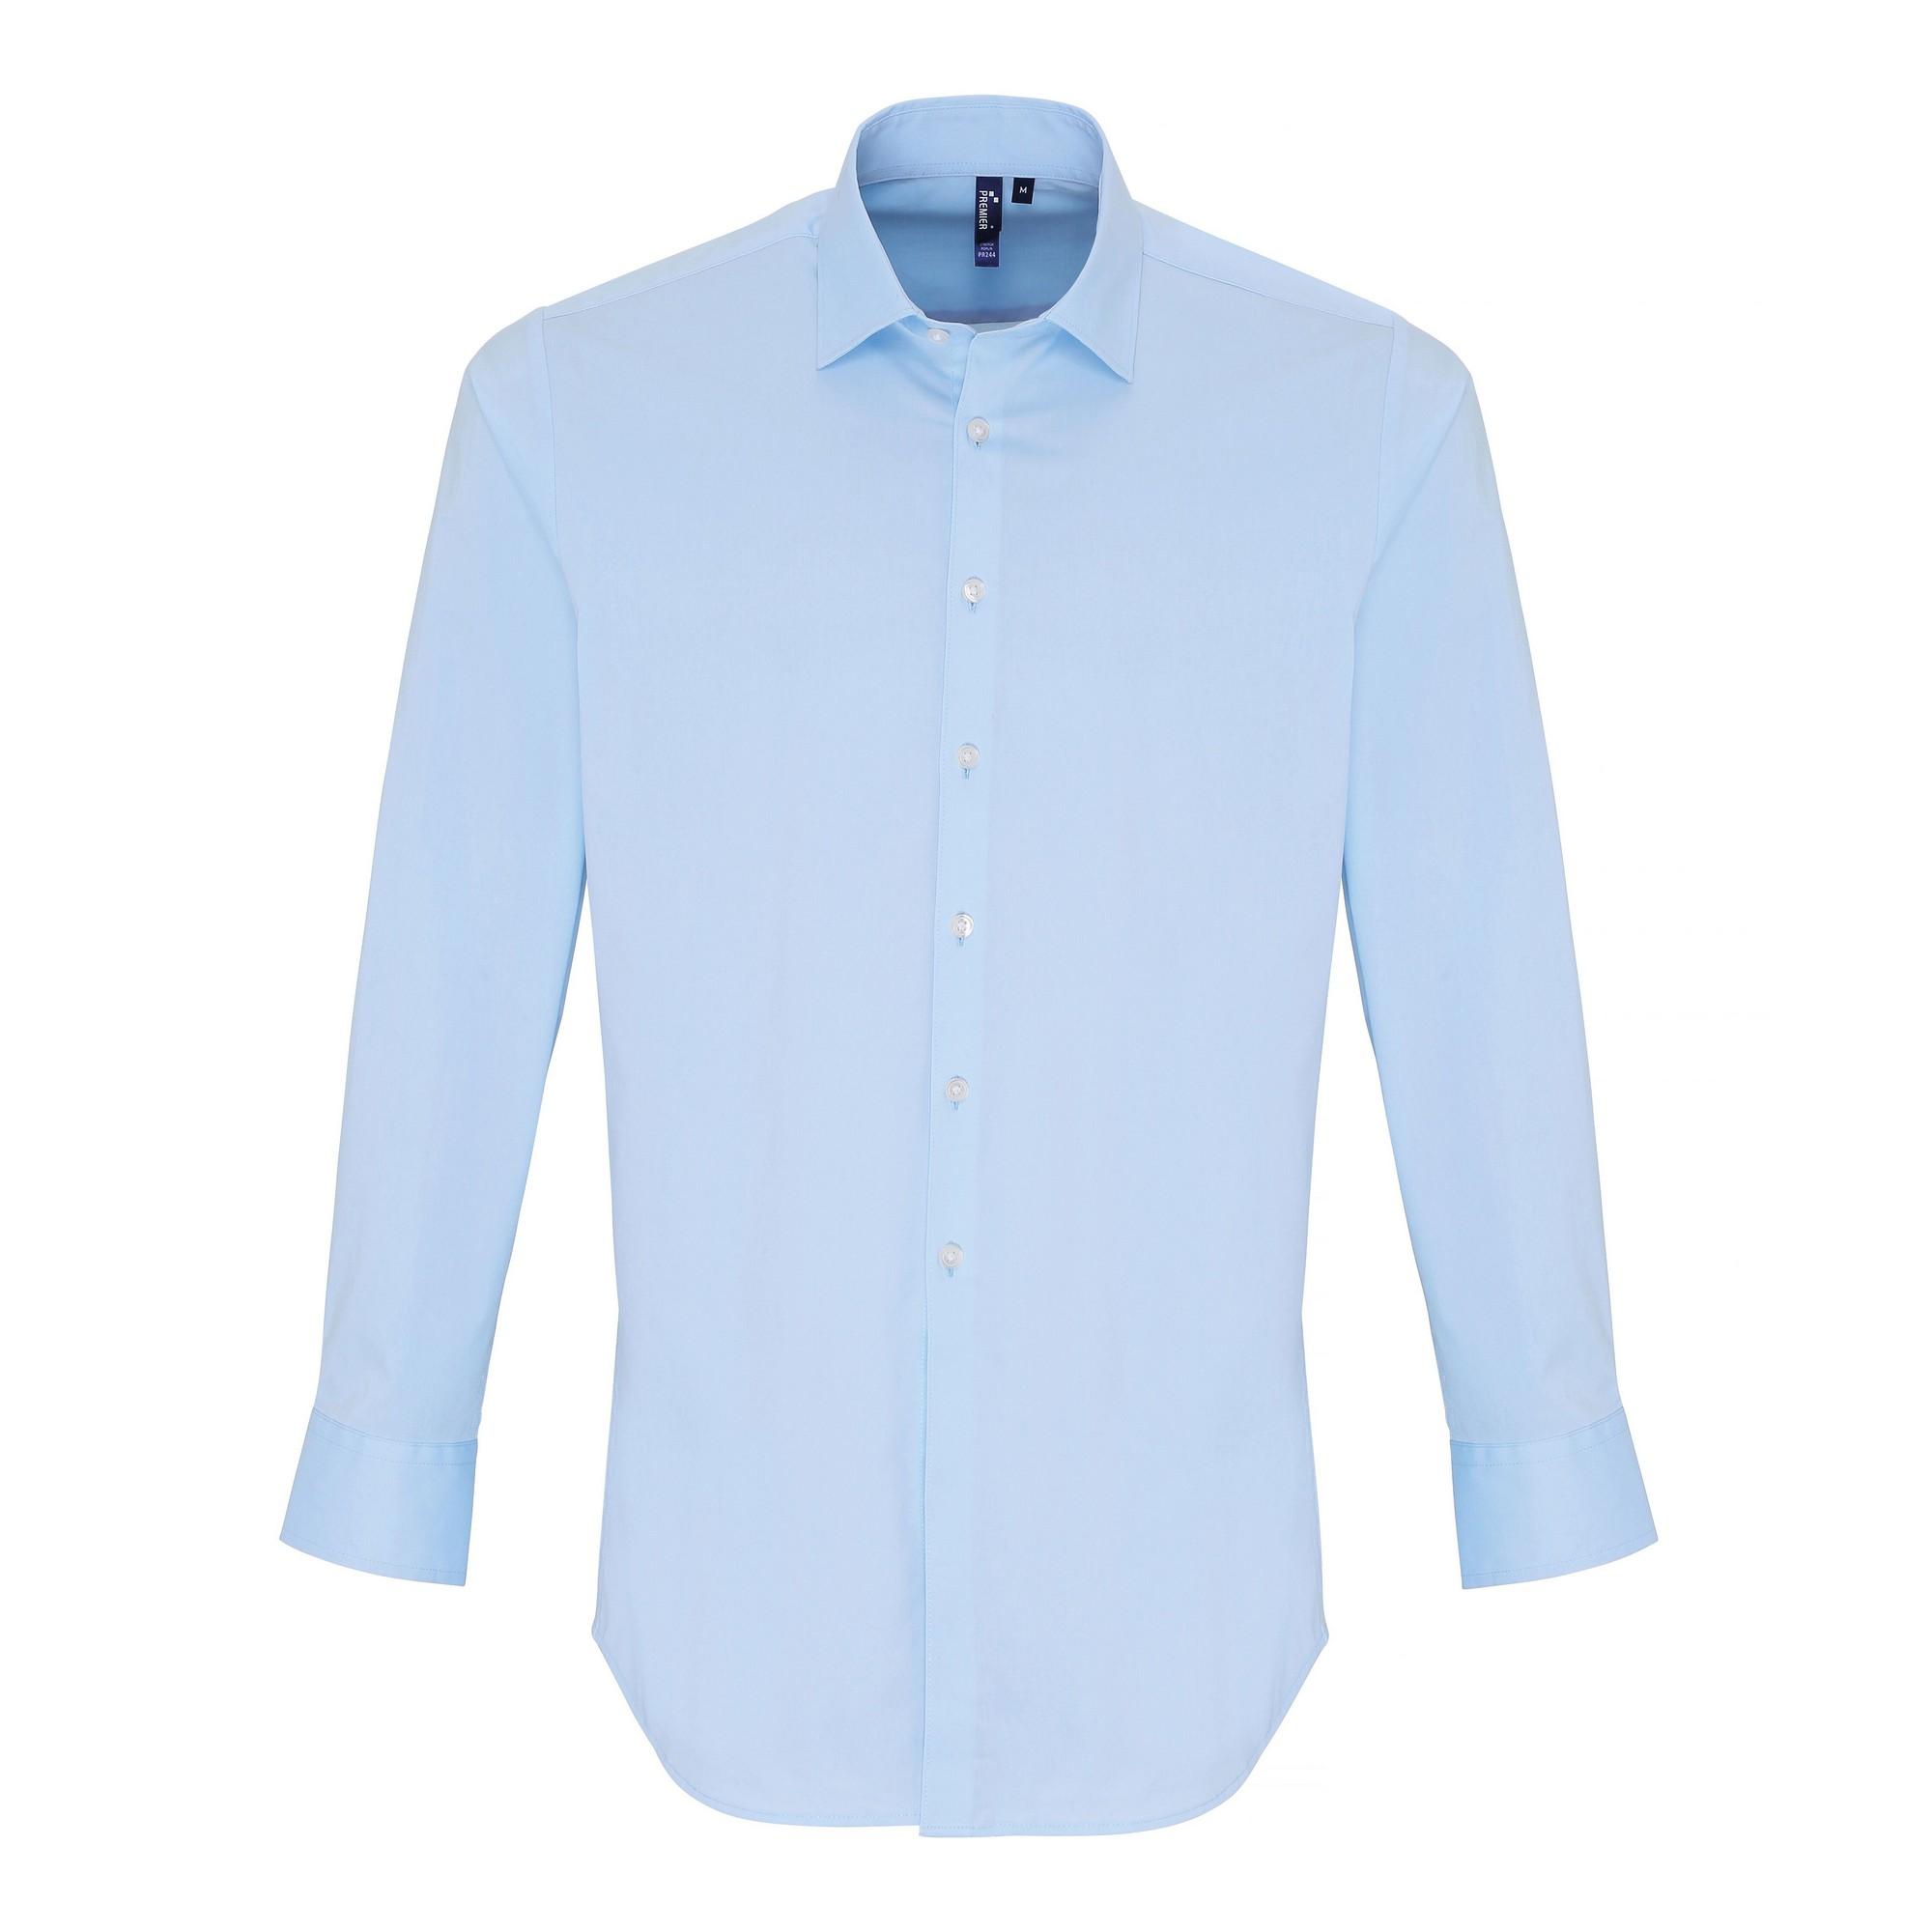 Premier Mens Stretch Fit Poplin Long Sleeve Shirt (S) (Pale Blue)